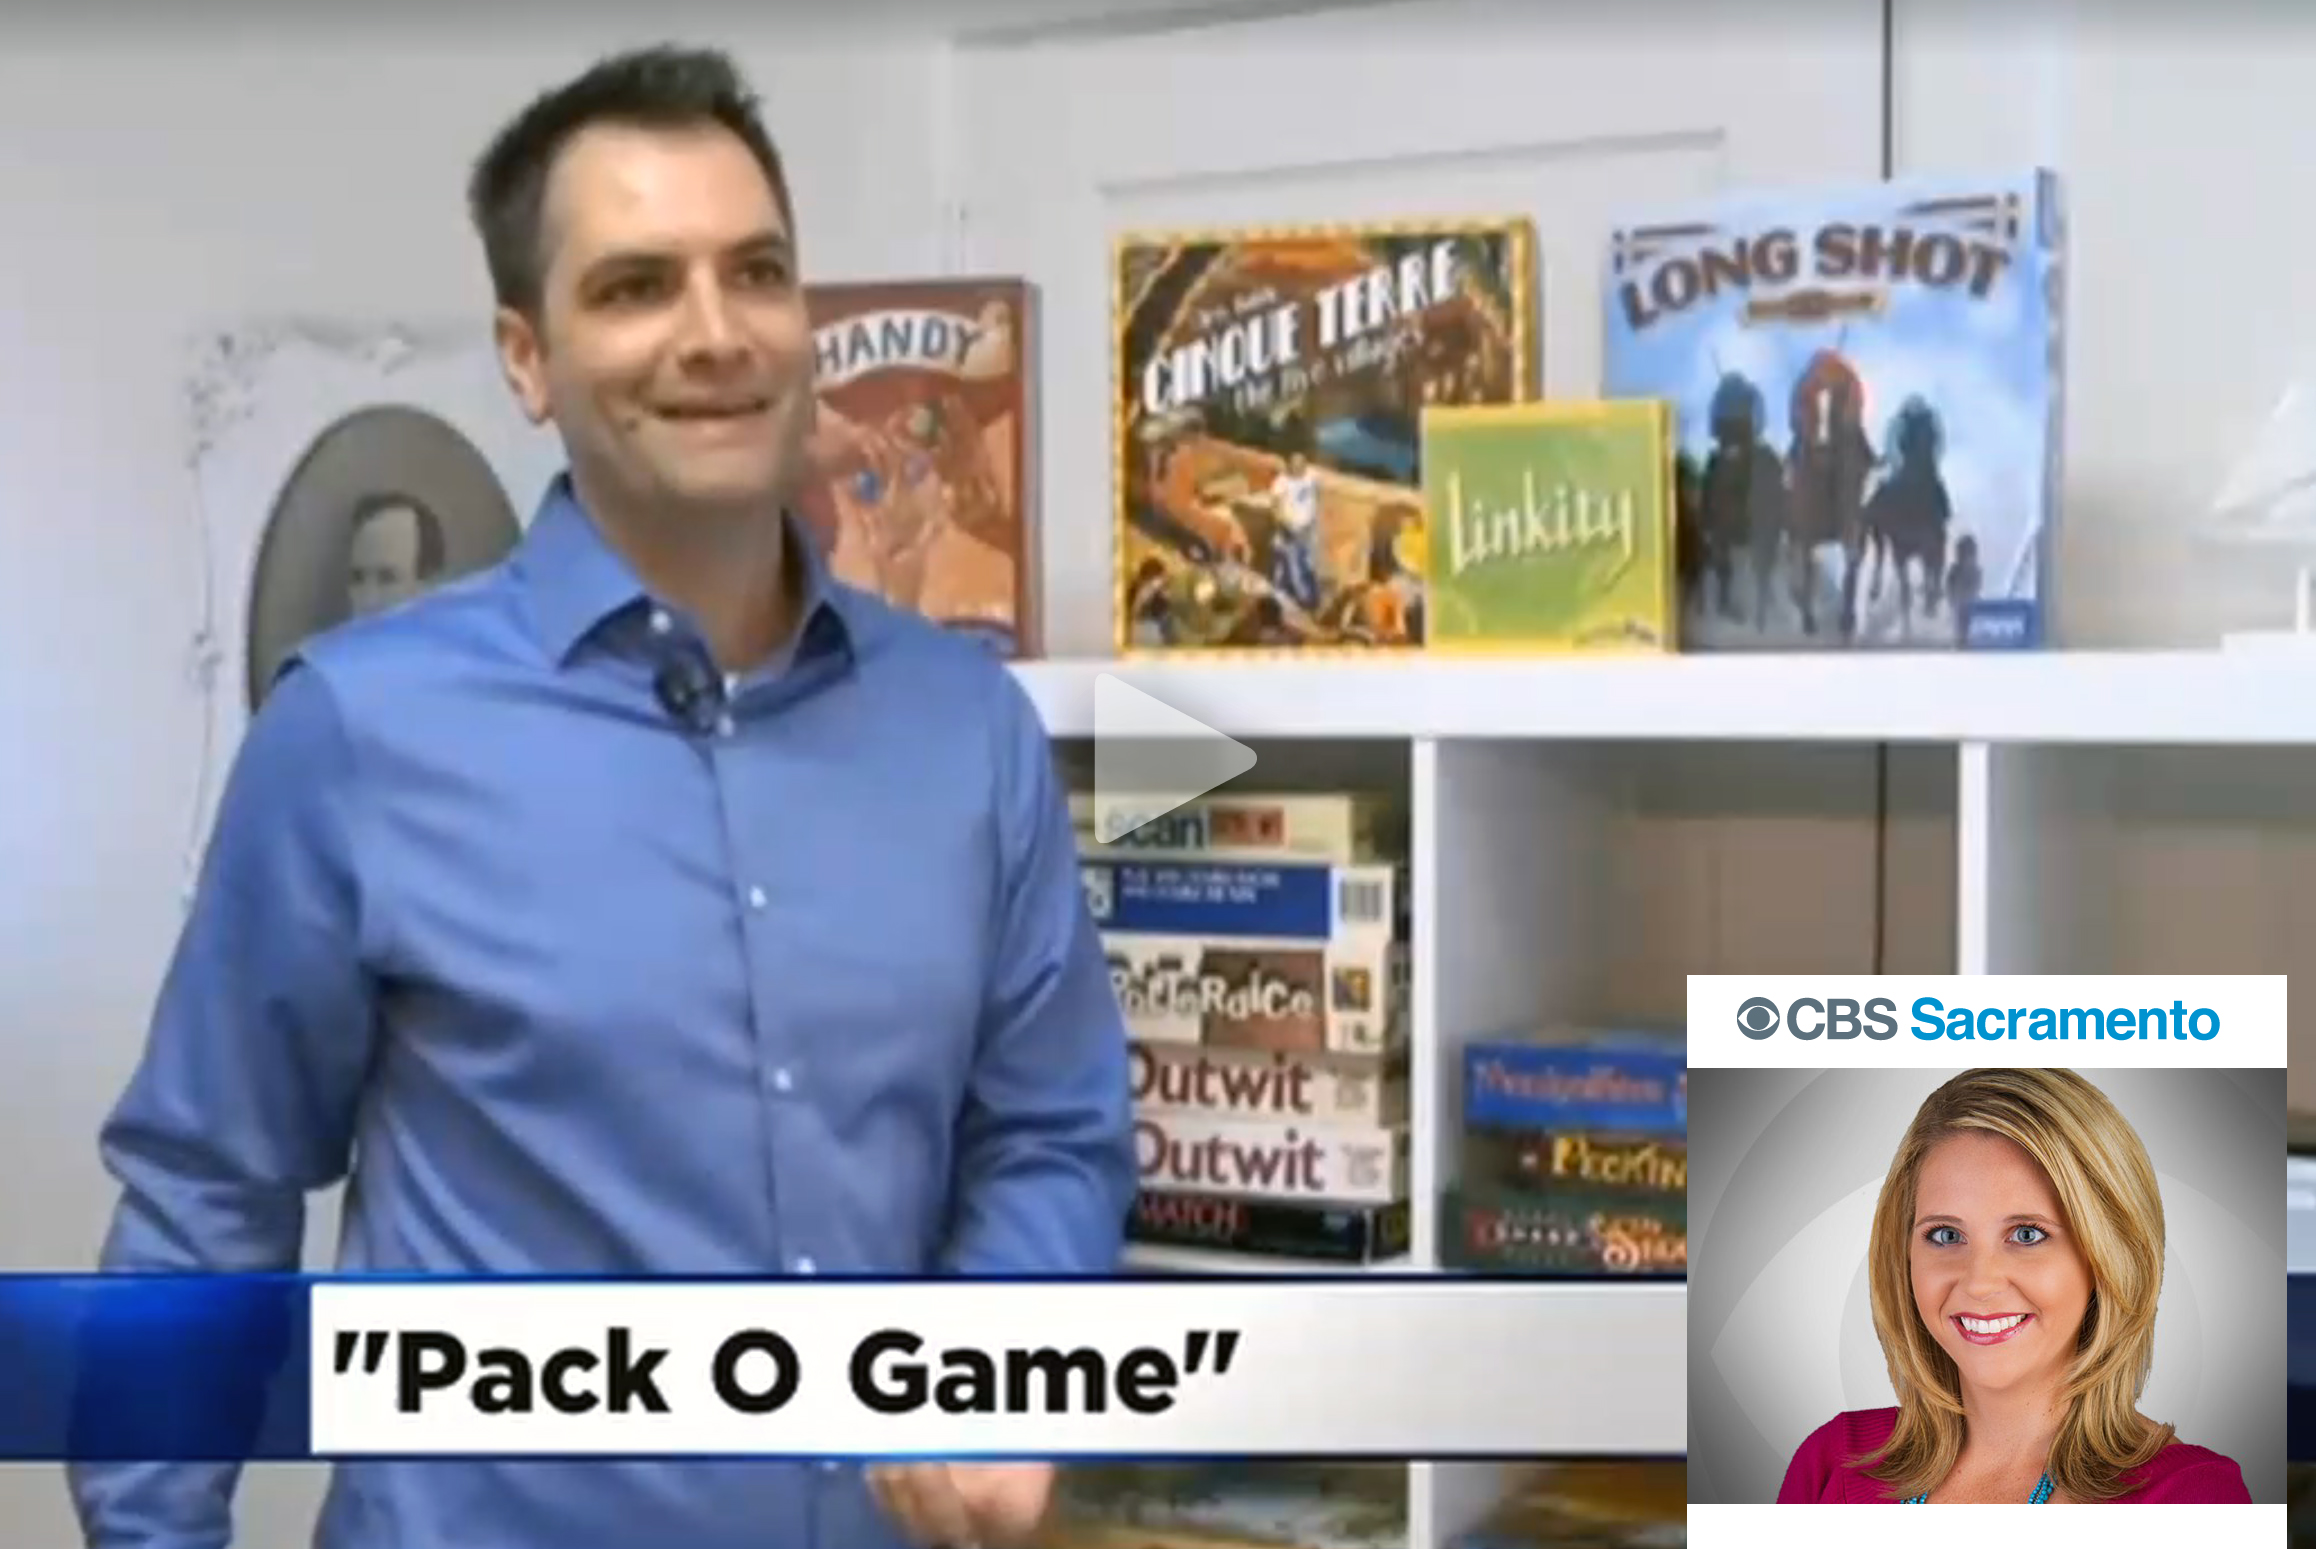 Chris_Handy_CBS_News_Pack_O_Game.jpg